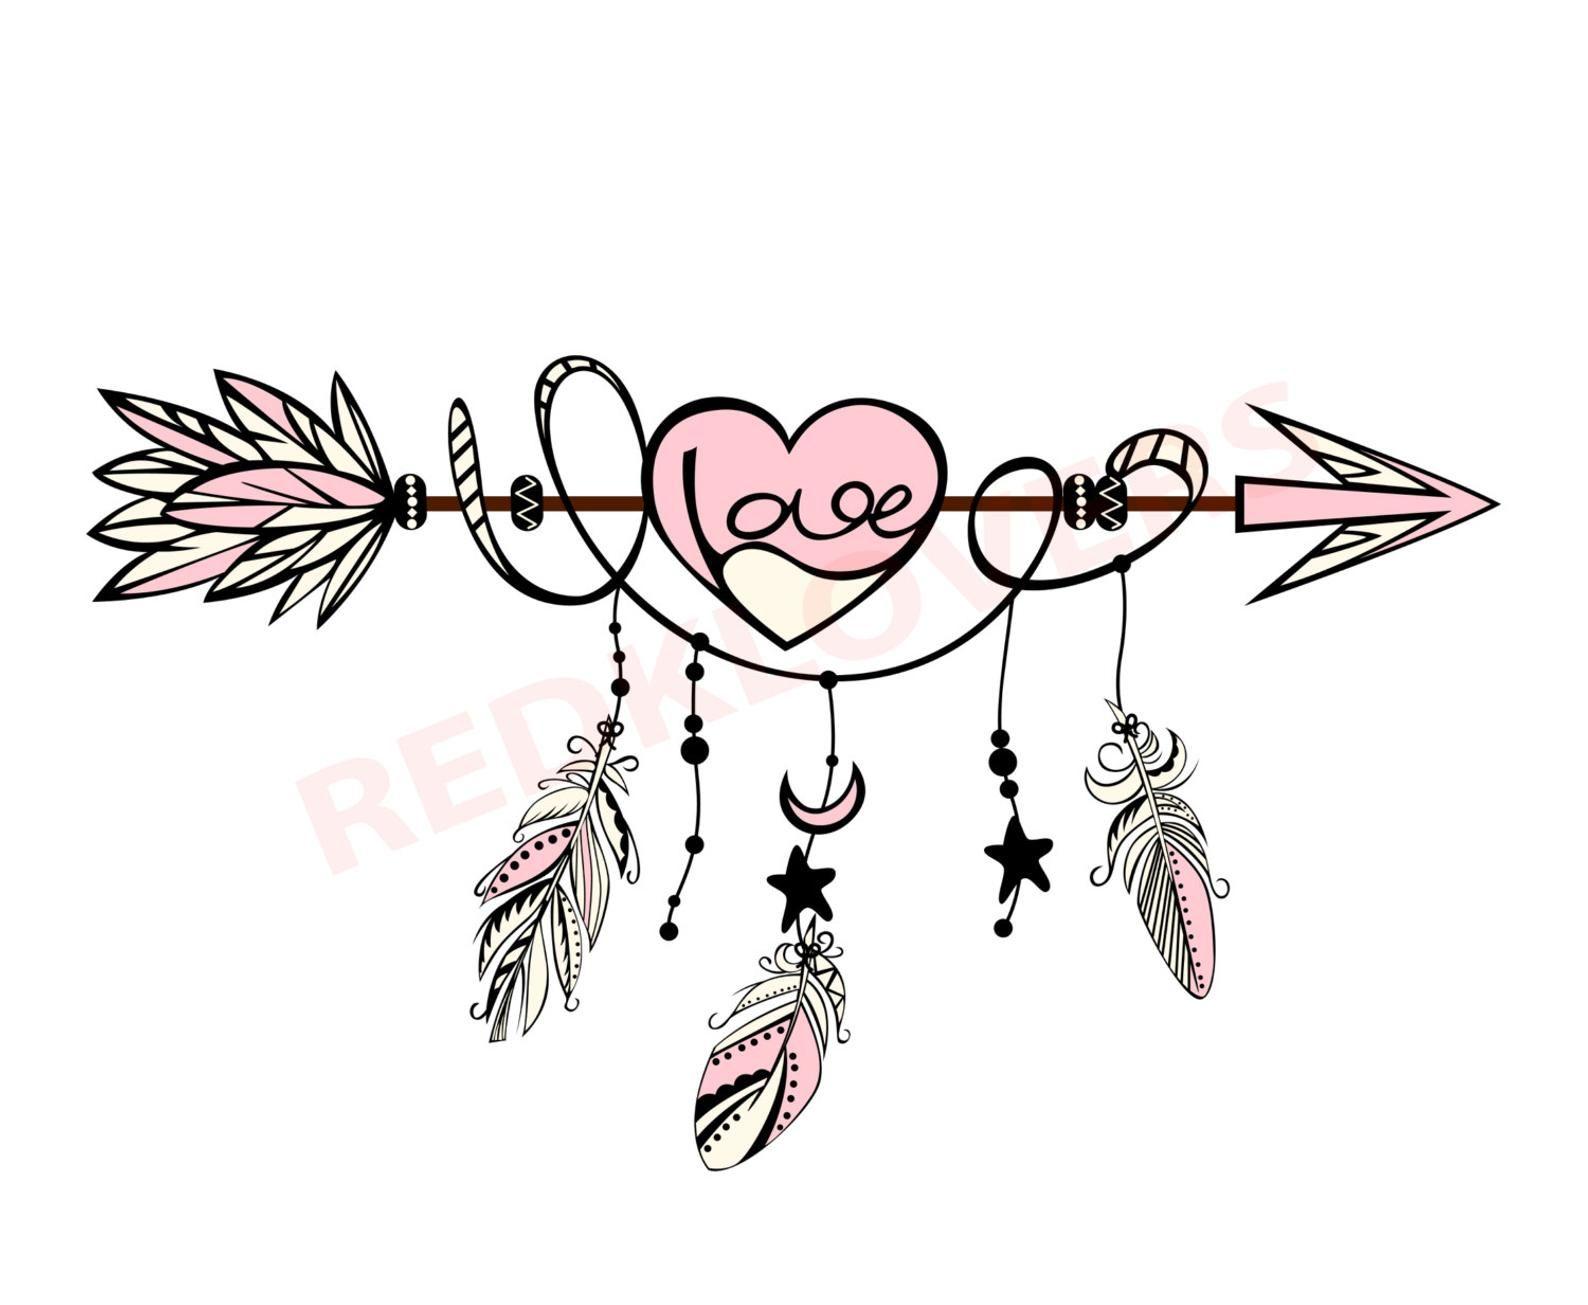 Svg Dxf Silhouette Feather Arrow Dreamcatcher Boho Native Love Scrapbook Digital Download Files Svg Ai Psd Png Pdf Tshirt Designs In 2021 Dream Catcher Tattoo Design Feather Tattoos Arrow Tattoo Design